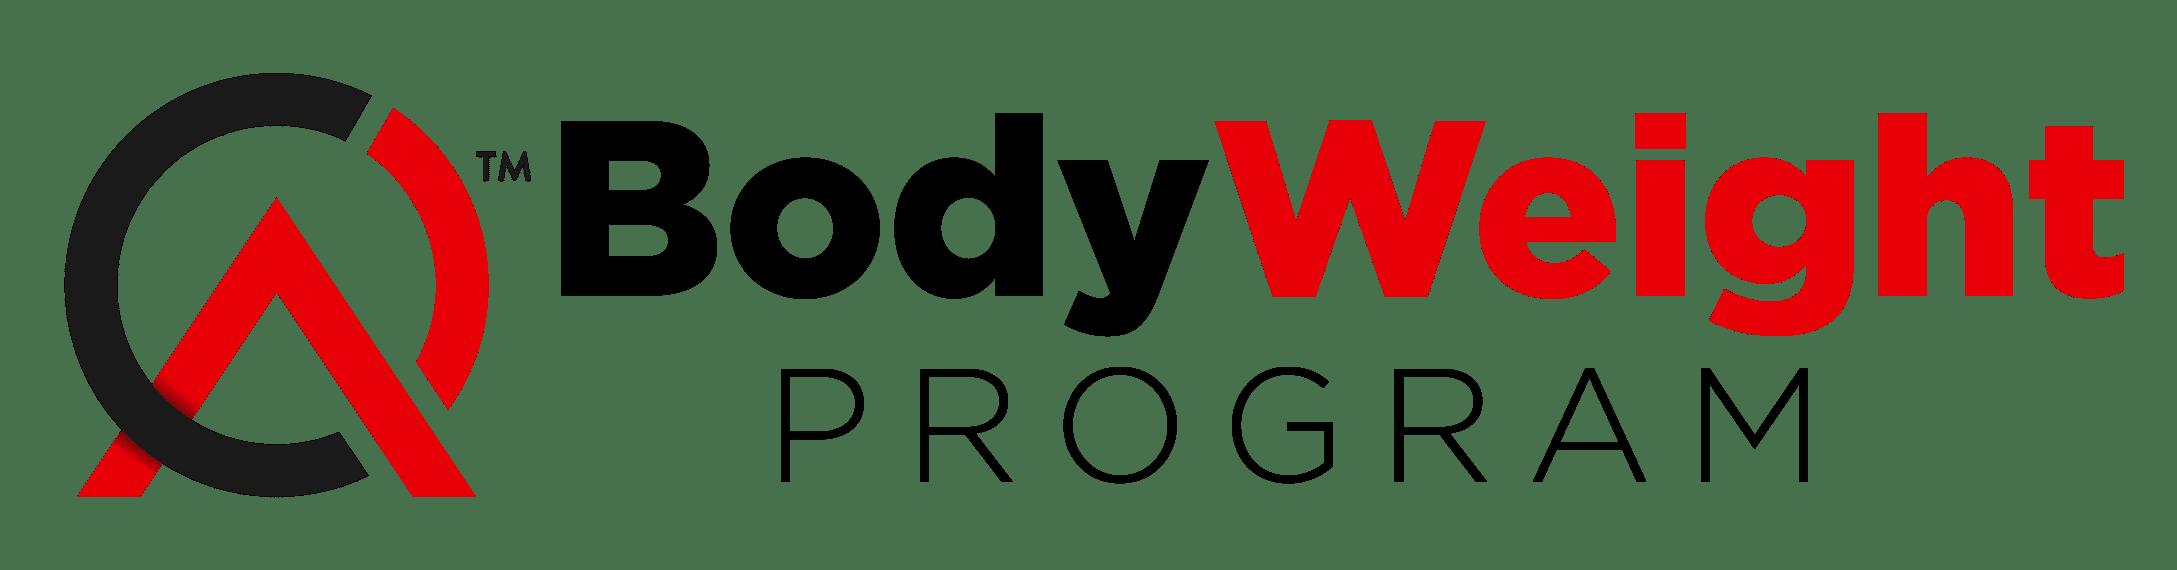 bodyweight-logo